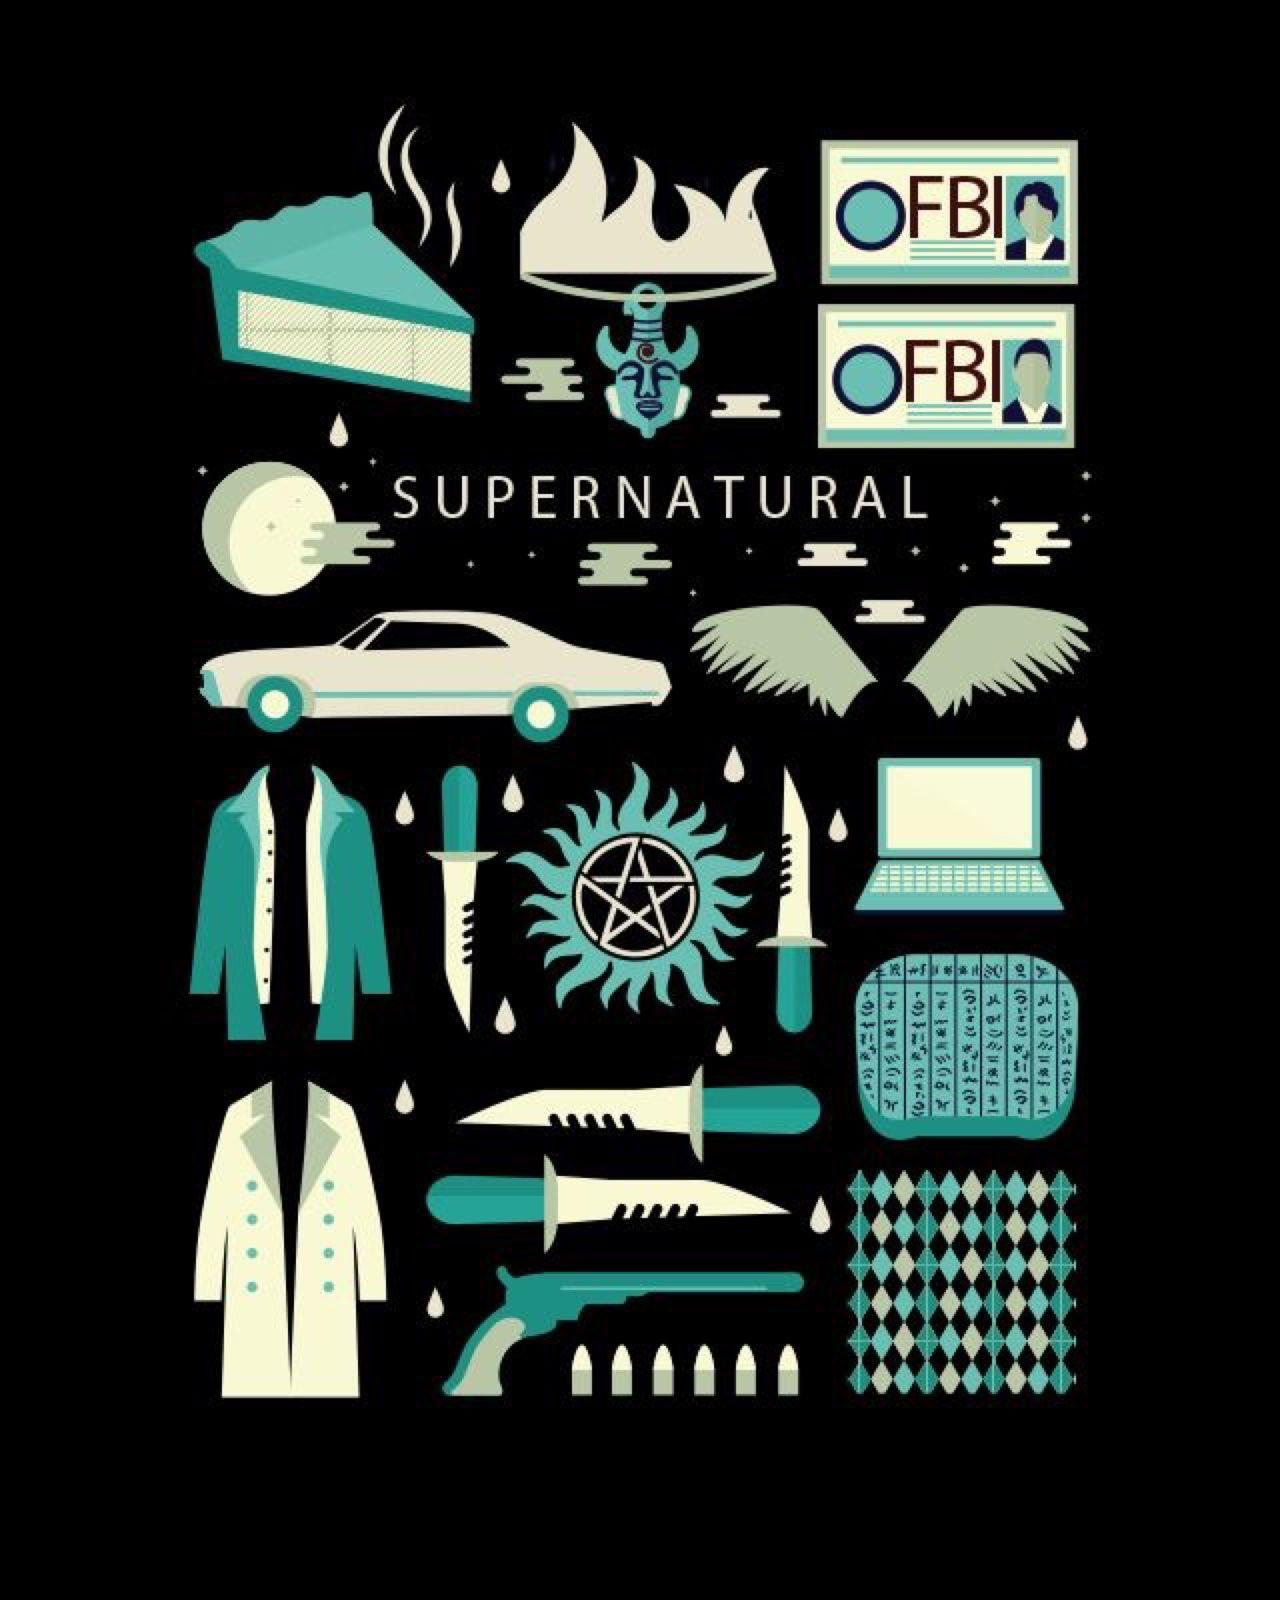 supernatural wallpaper Tumblr Supernatural Pinterest